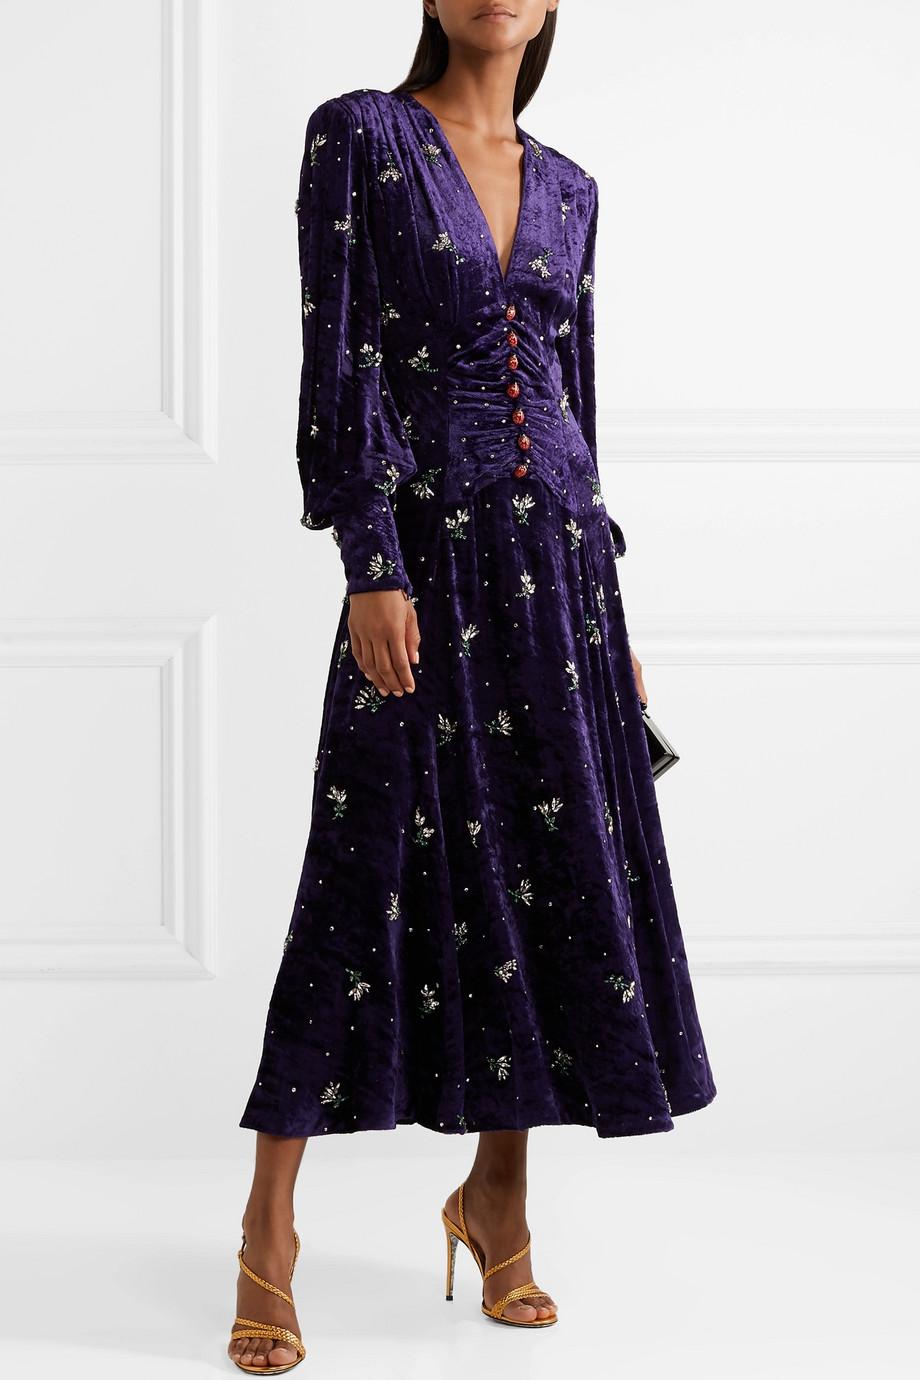 Gucci Robe midi en velours à ornements